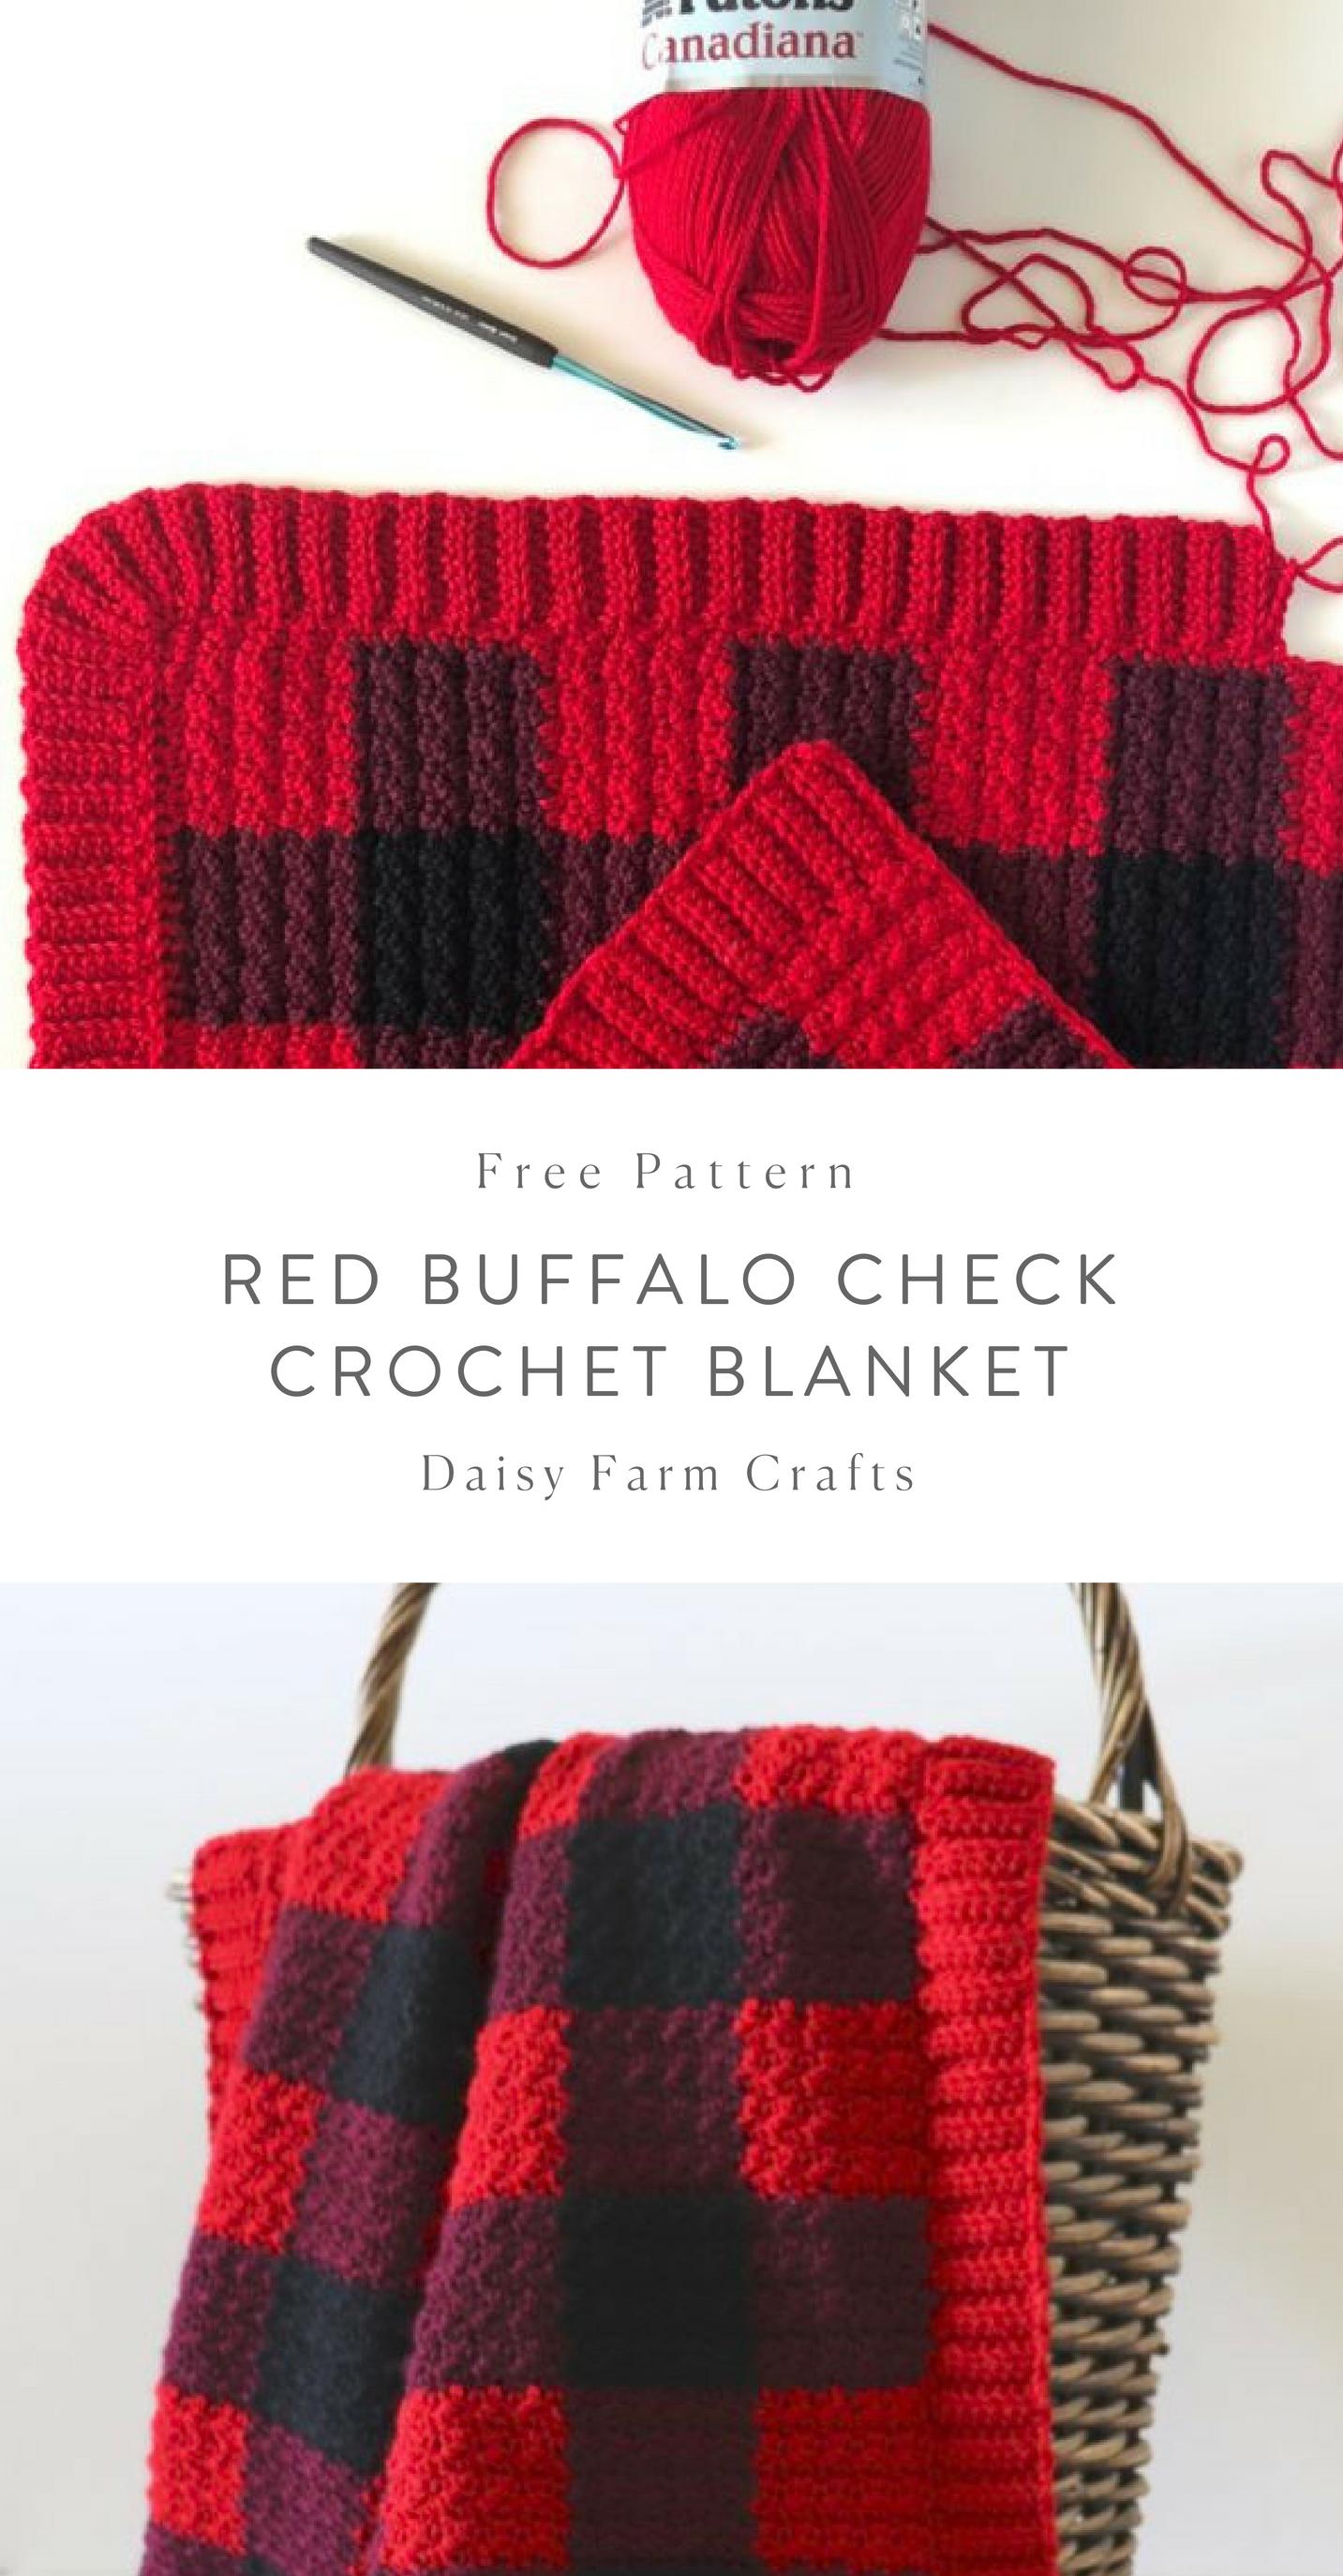 Red Buffalo Check Crochet Blanket - Daisy Farm Crafts | pp ...